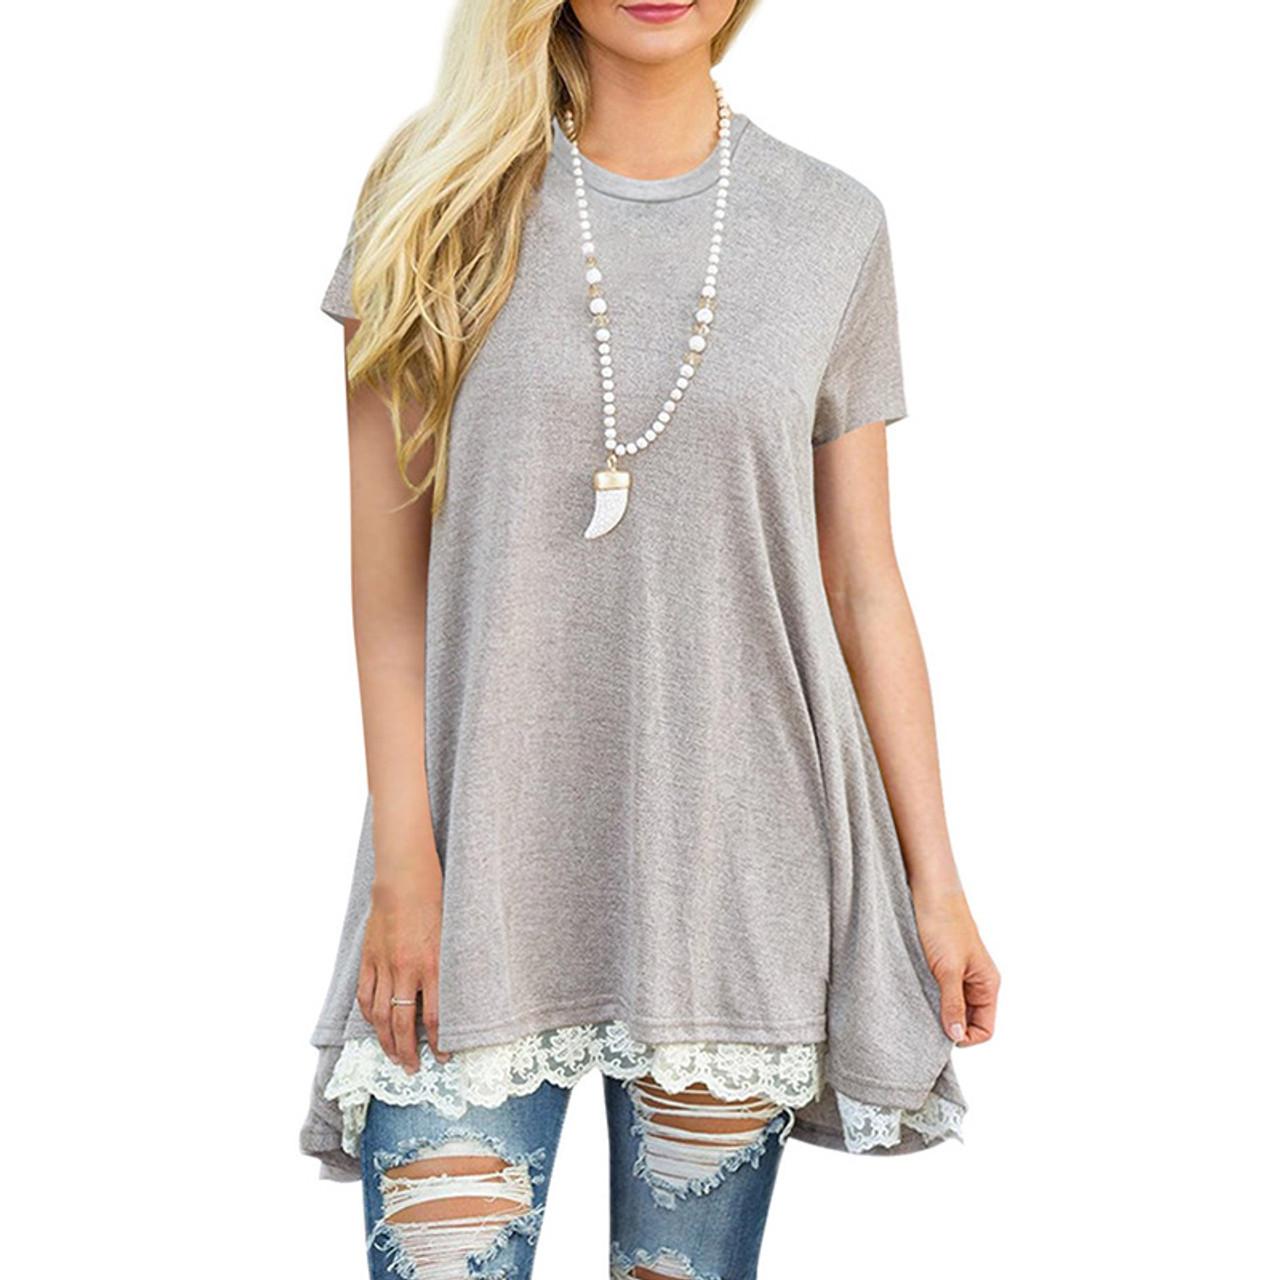 f5779498e606e Patchwork Lace Loose Long T Shirt Women Top Tee Shirt Femme 2018 Spring  Summer Casual Short ...